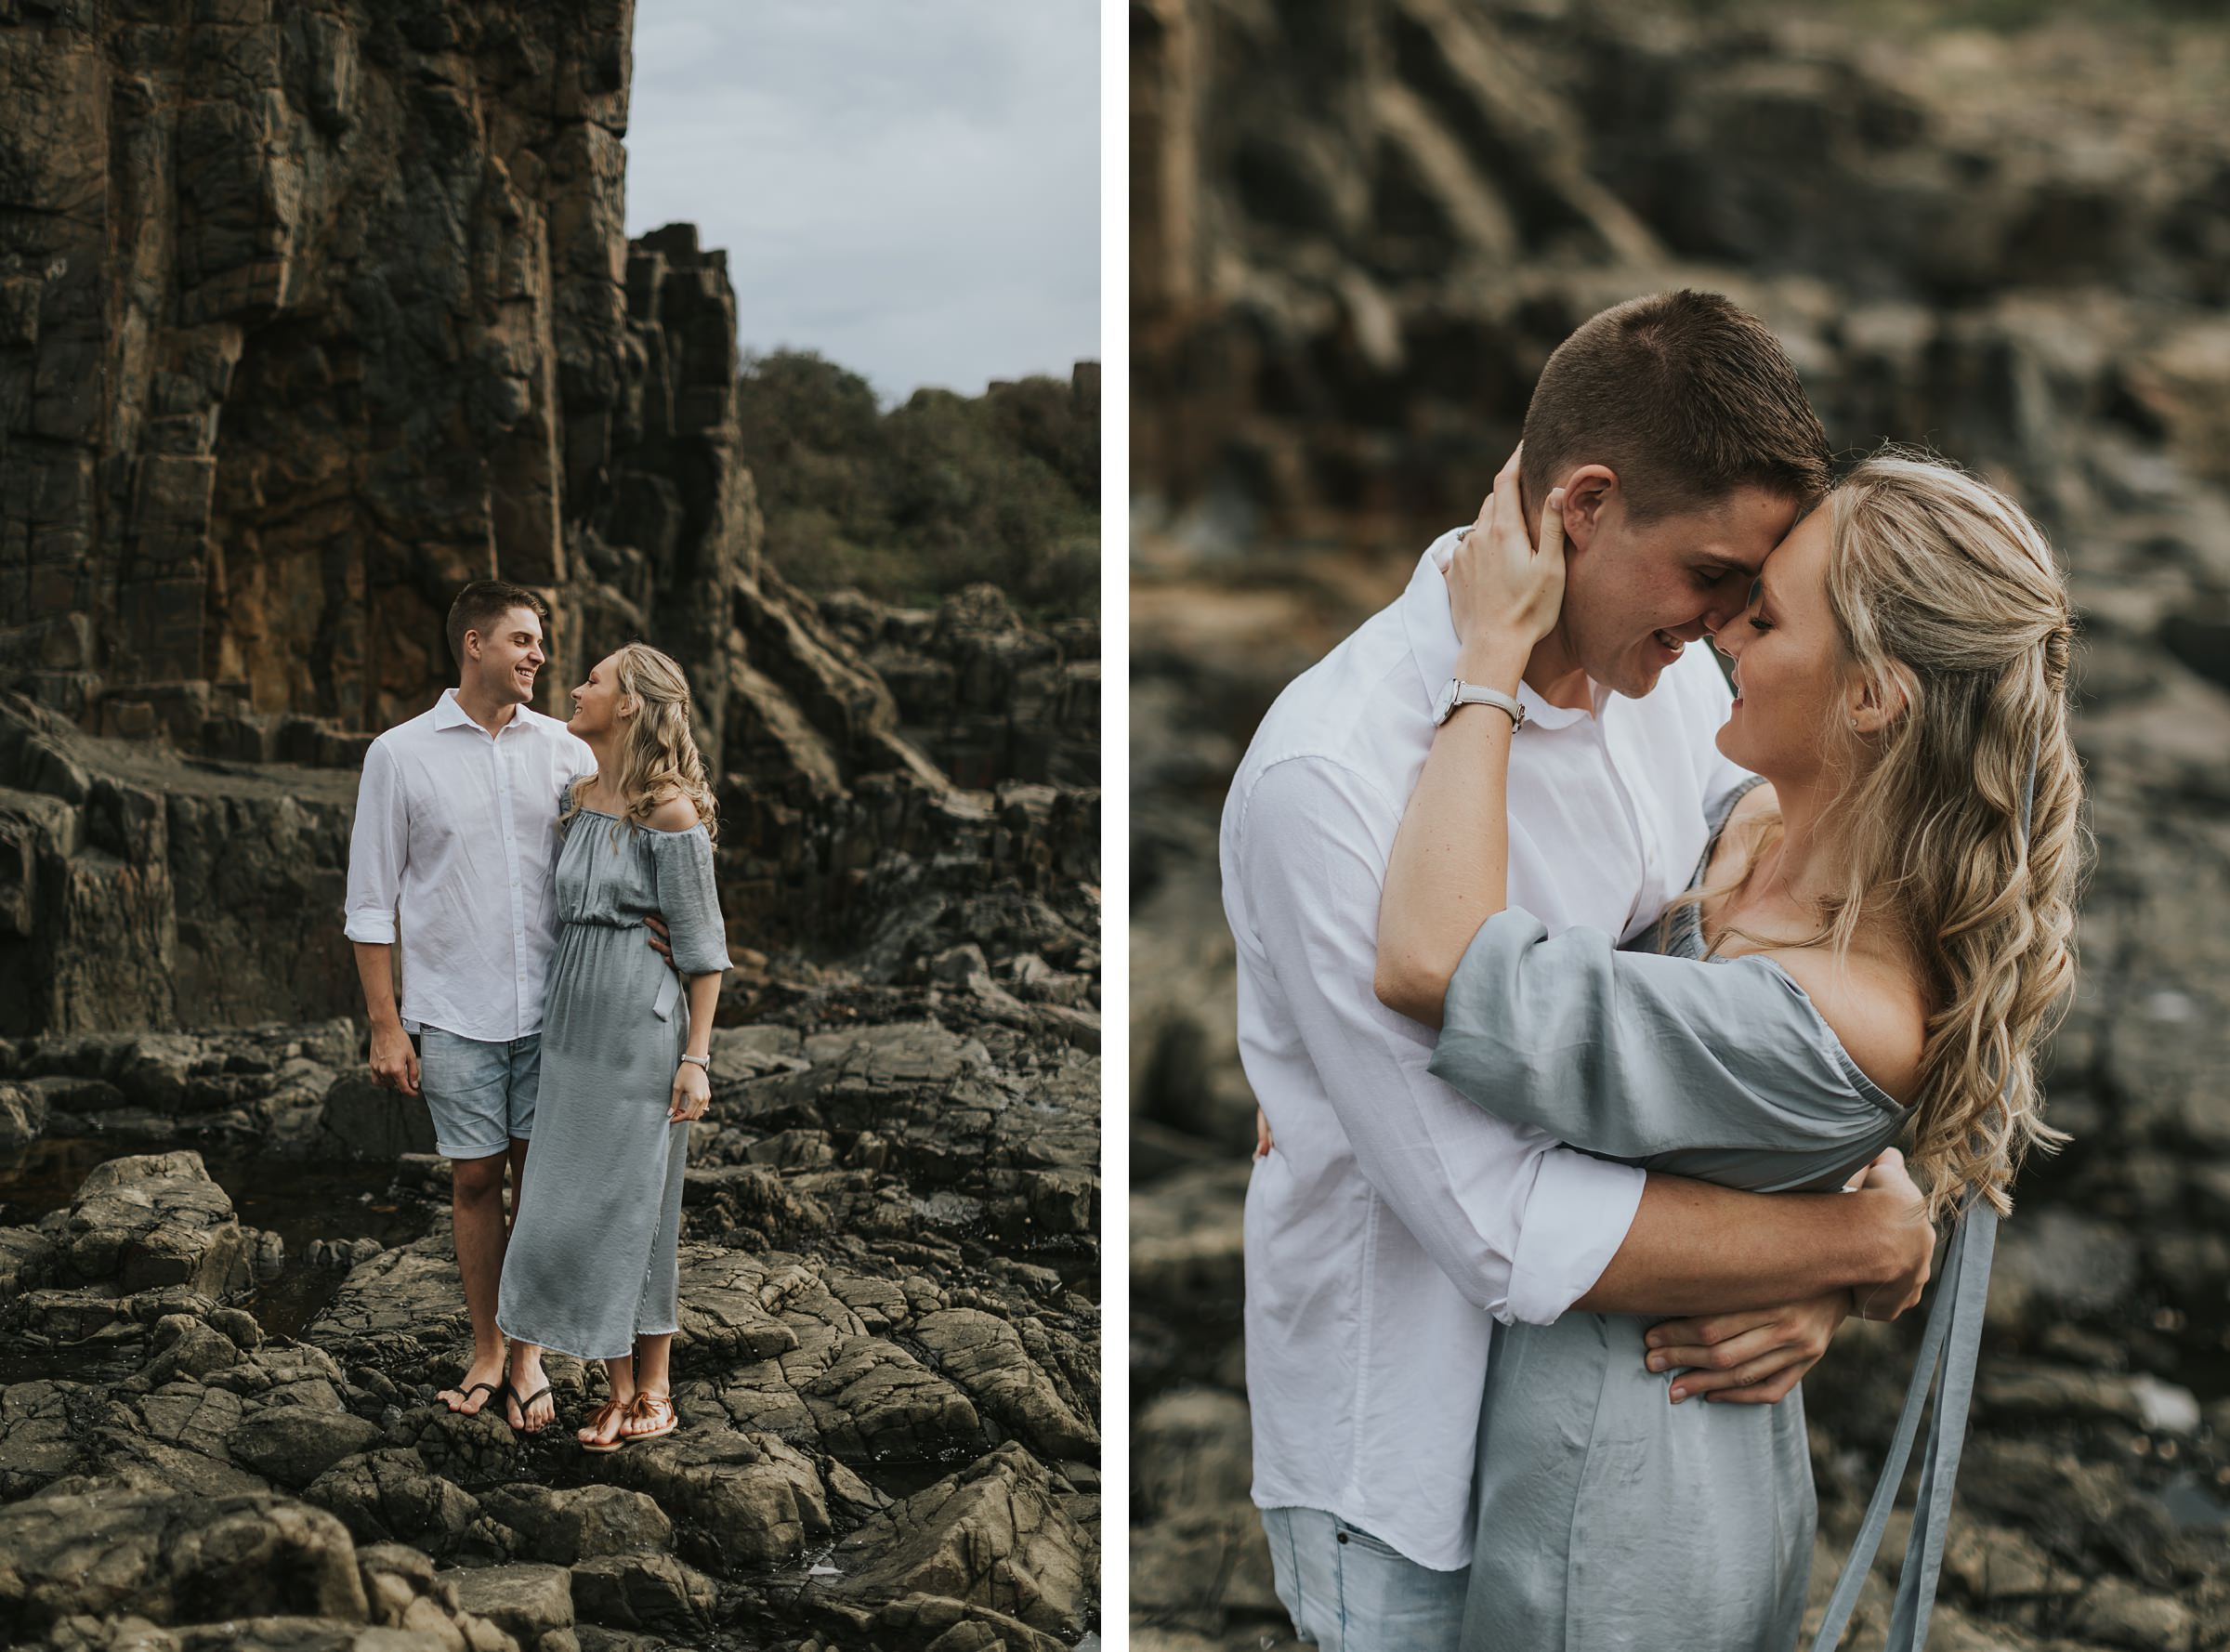 wedding photos at bombo quarry nsw south coast